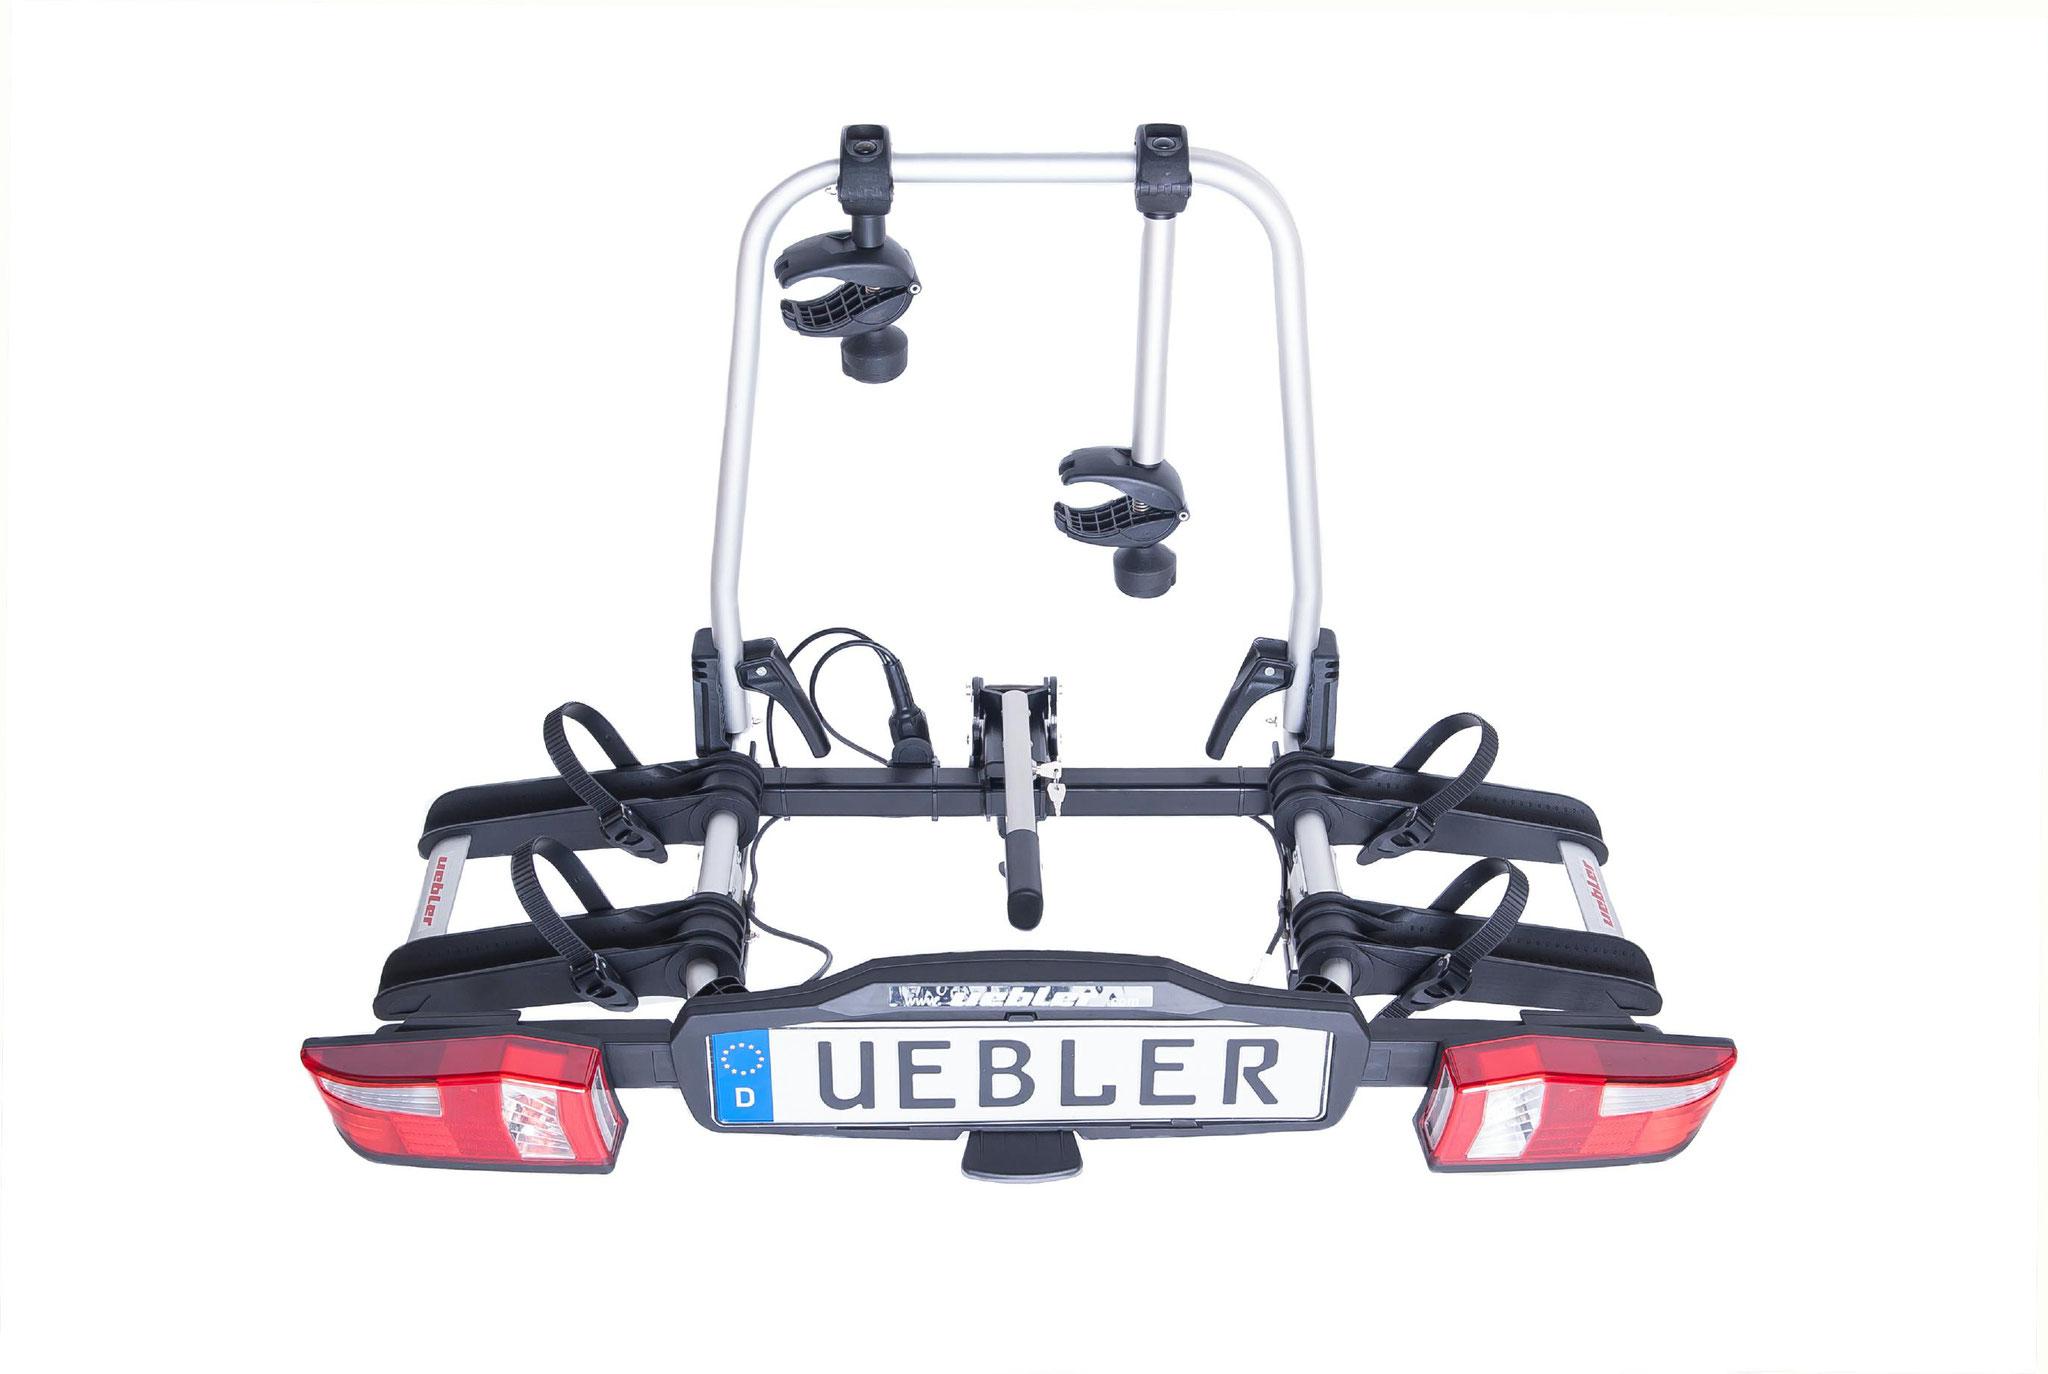 Uebler Fahrradheckträger X21 S für 2 e-Bikes